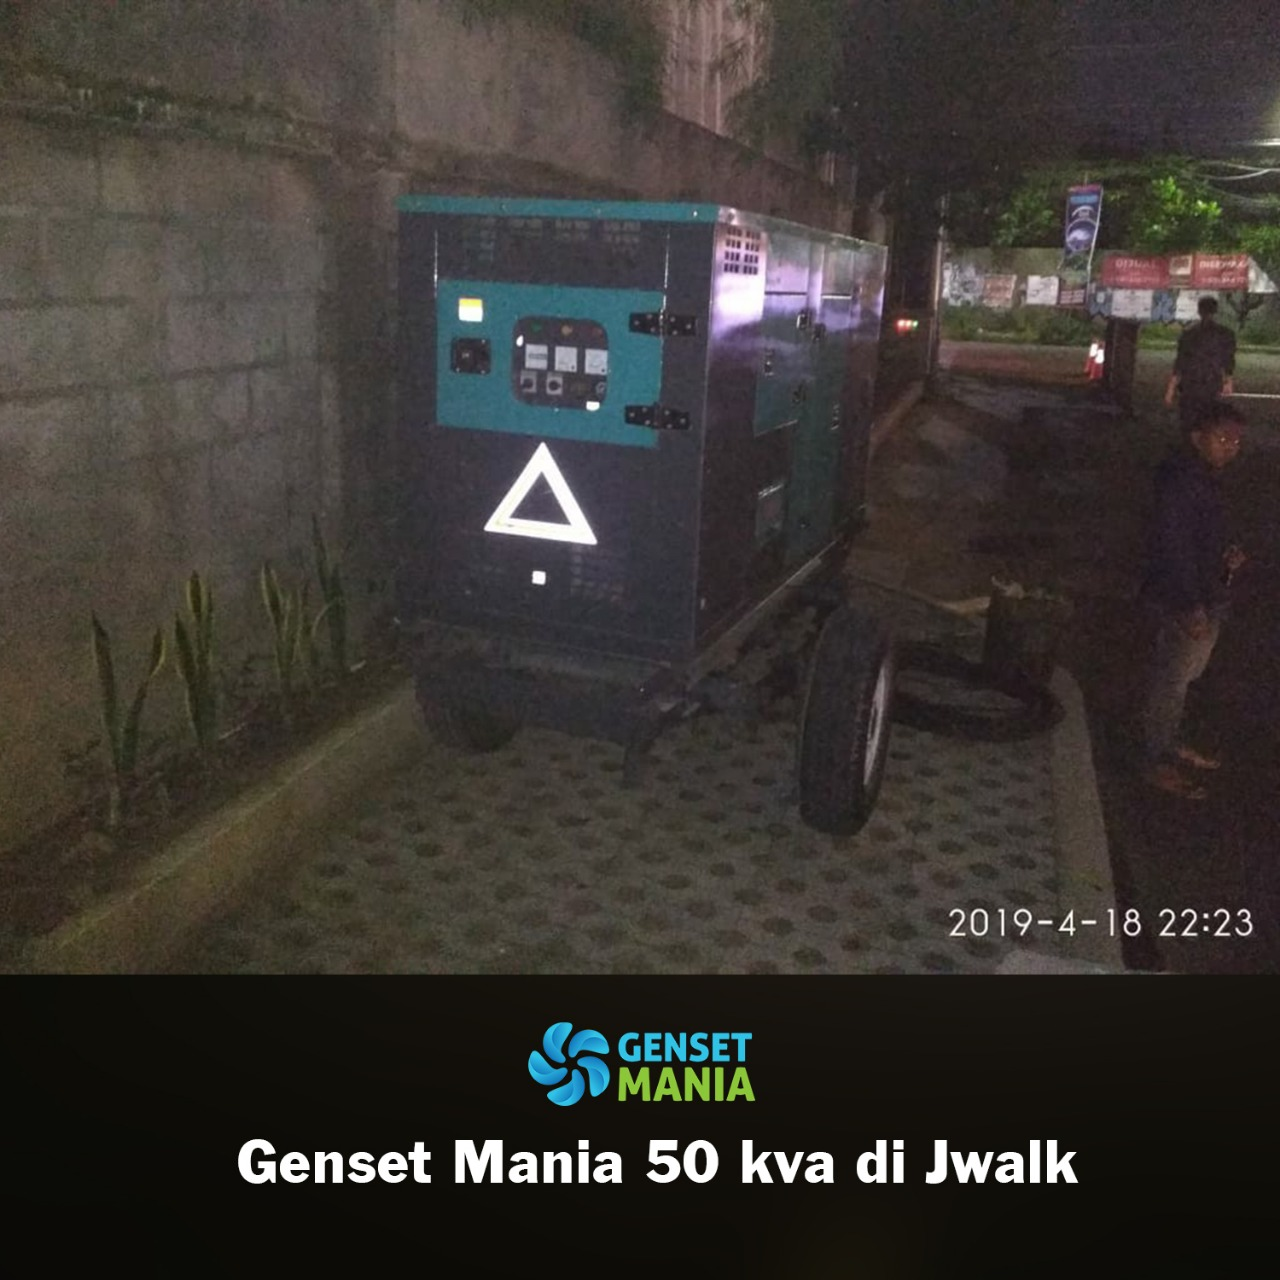 Genset Proyek New International Yogyakarta Airport | GENSETMANIA SEWA GENSET JOGJA - Sewa menyewa jadi lebih mudah di Spotsewa